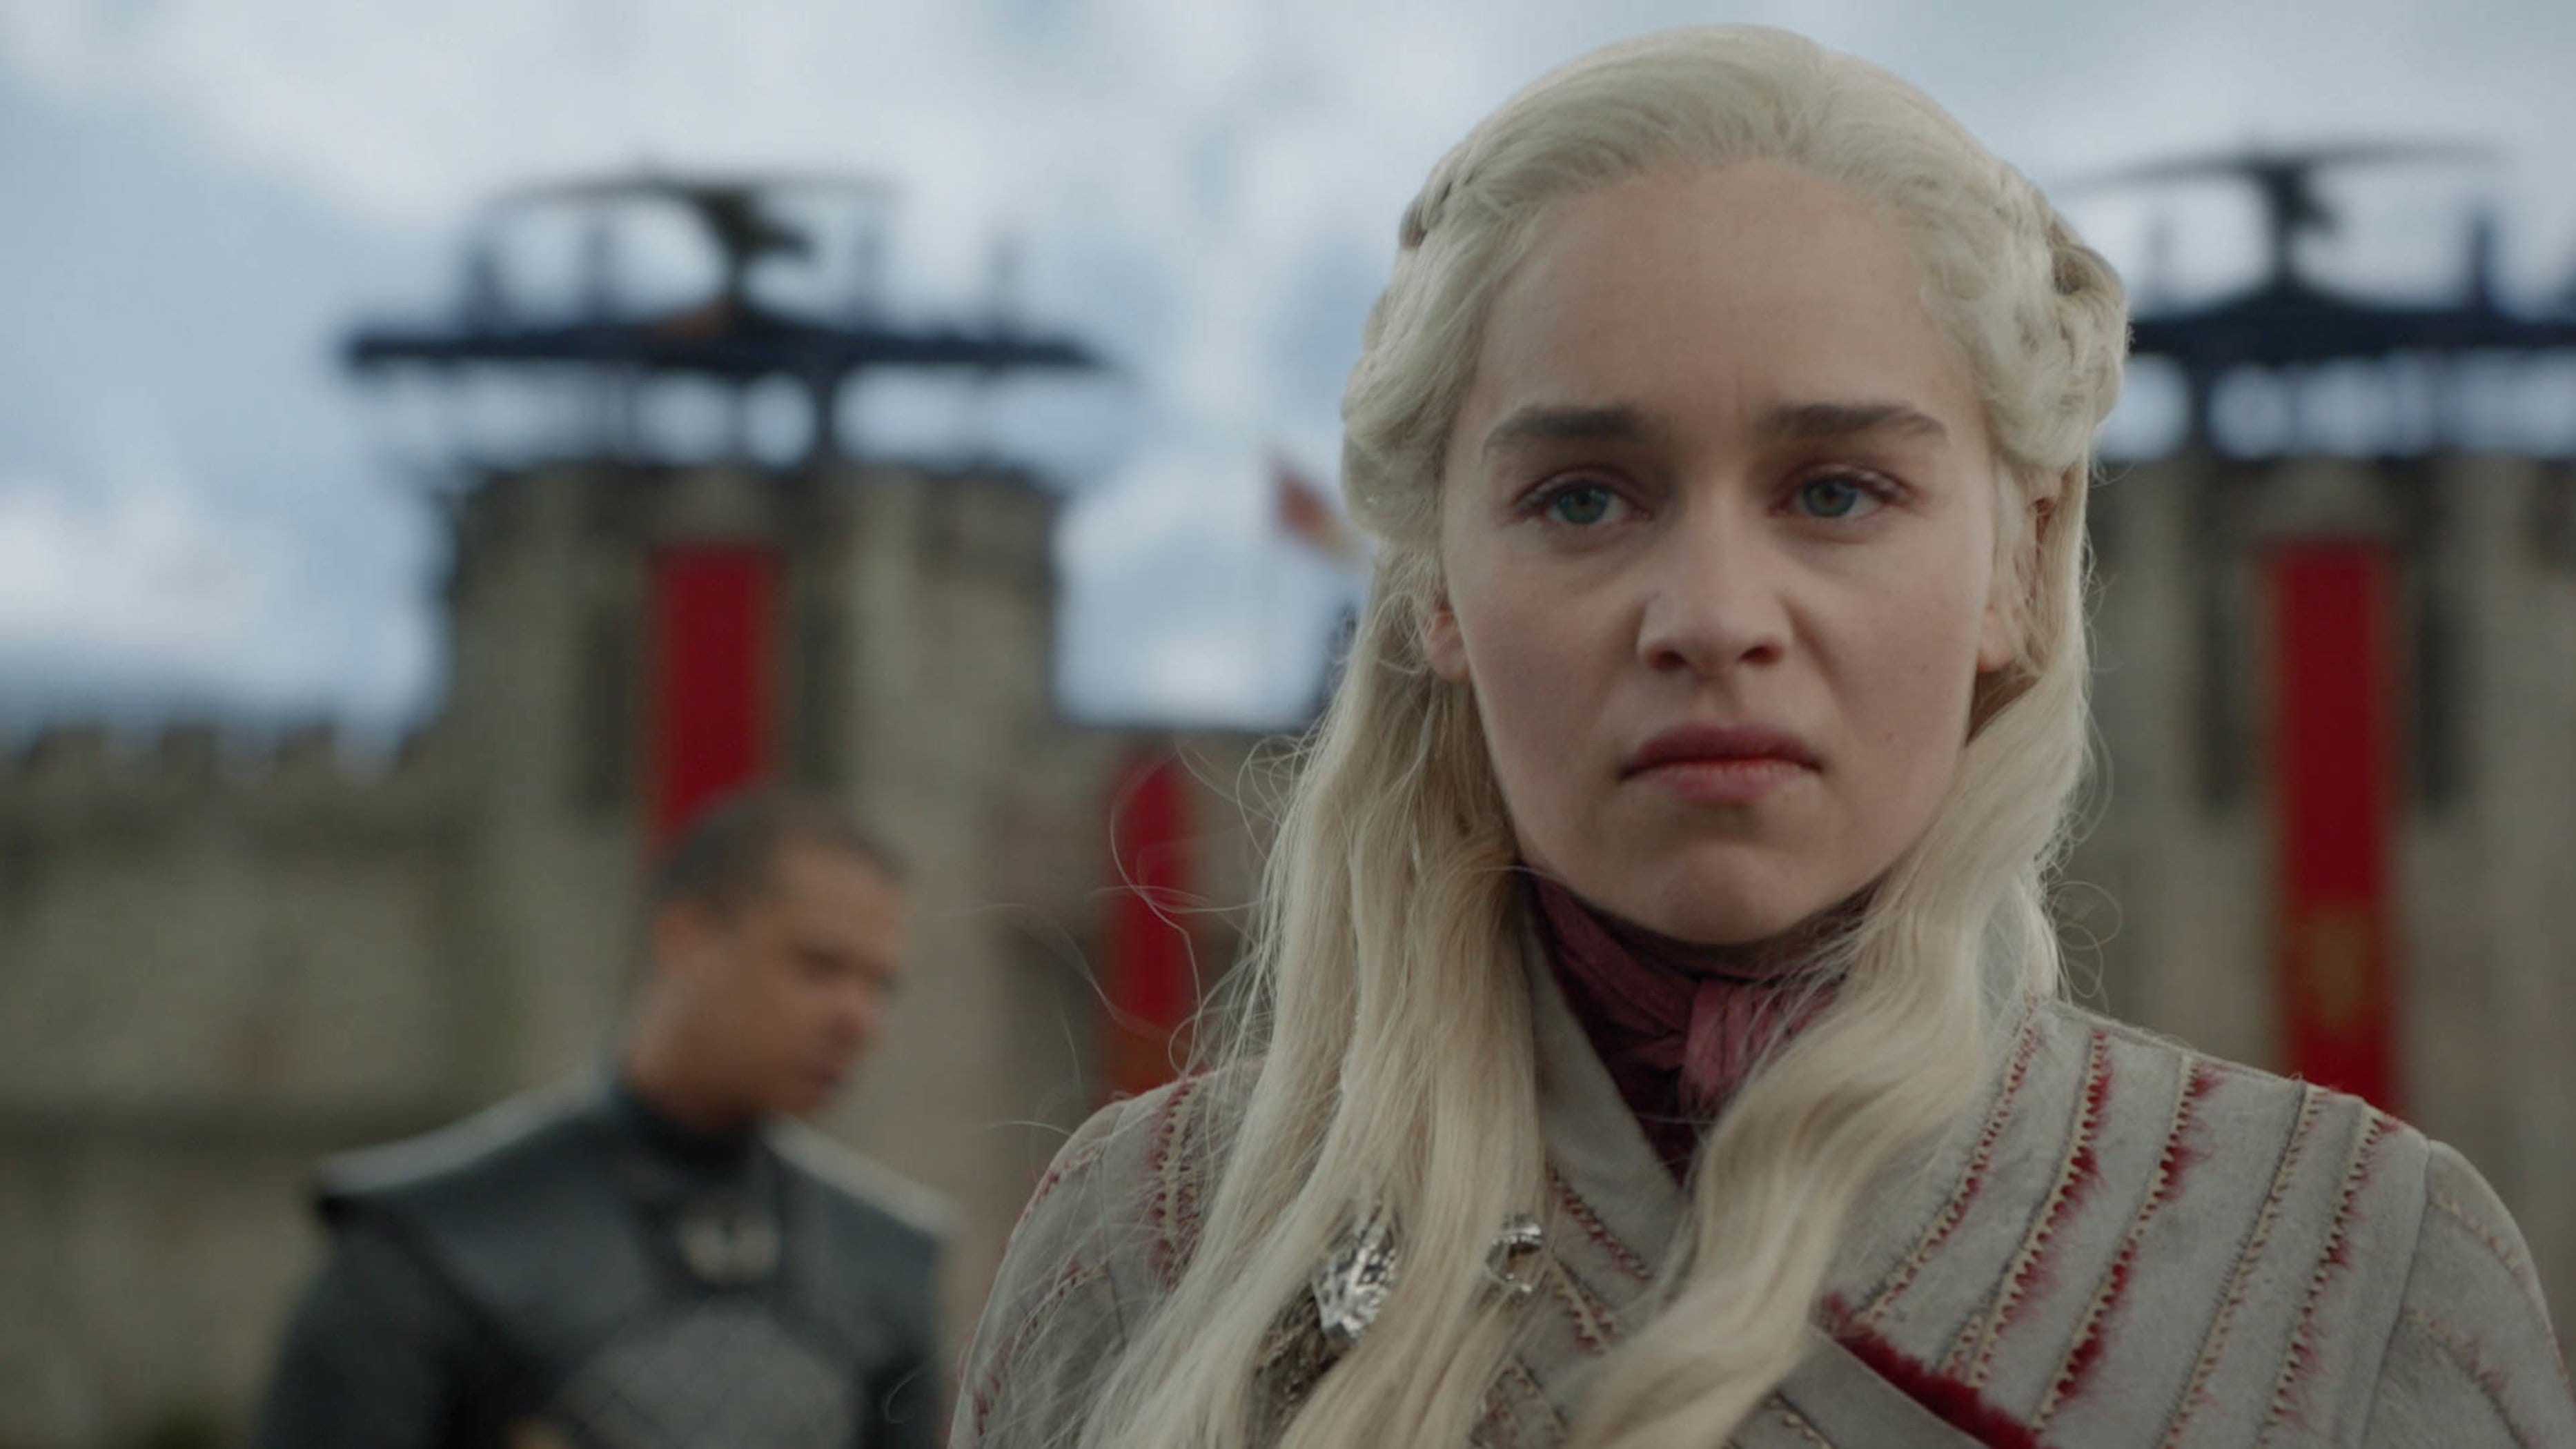 Game of Thrones Season 8 Episode 5 mad Queen dany